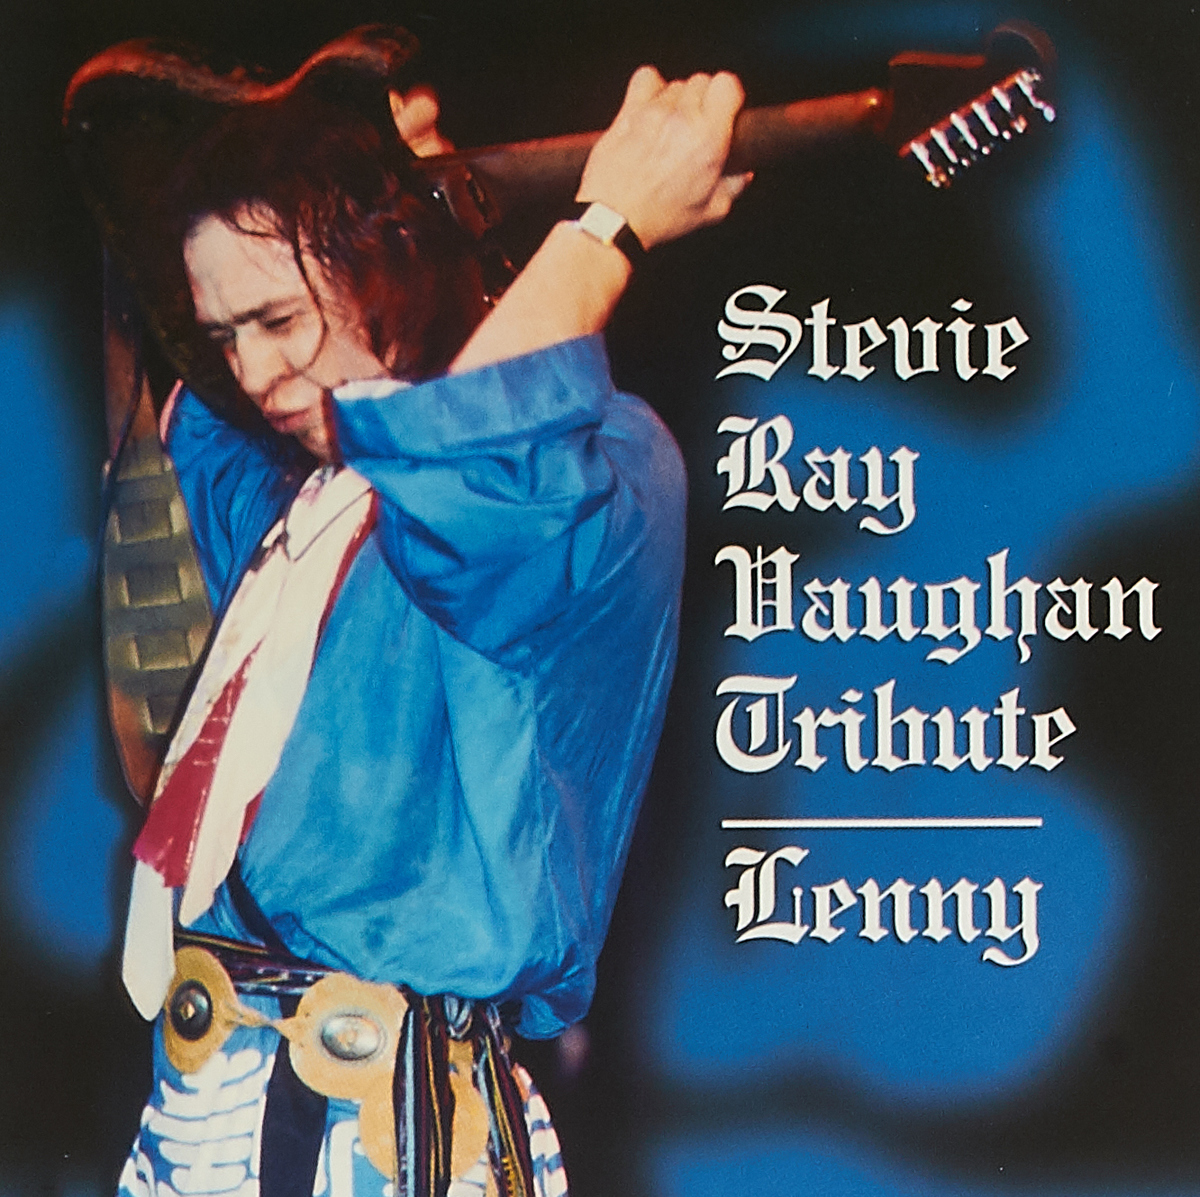 Стиви Рэй Воэн Stevie Ray Vaughan Tribute. Lenny stevie ray vaughan stevie ray vaughan soul to soul